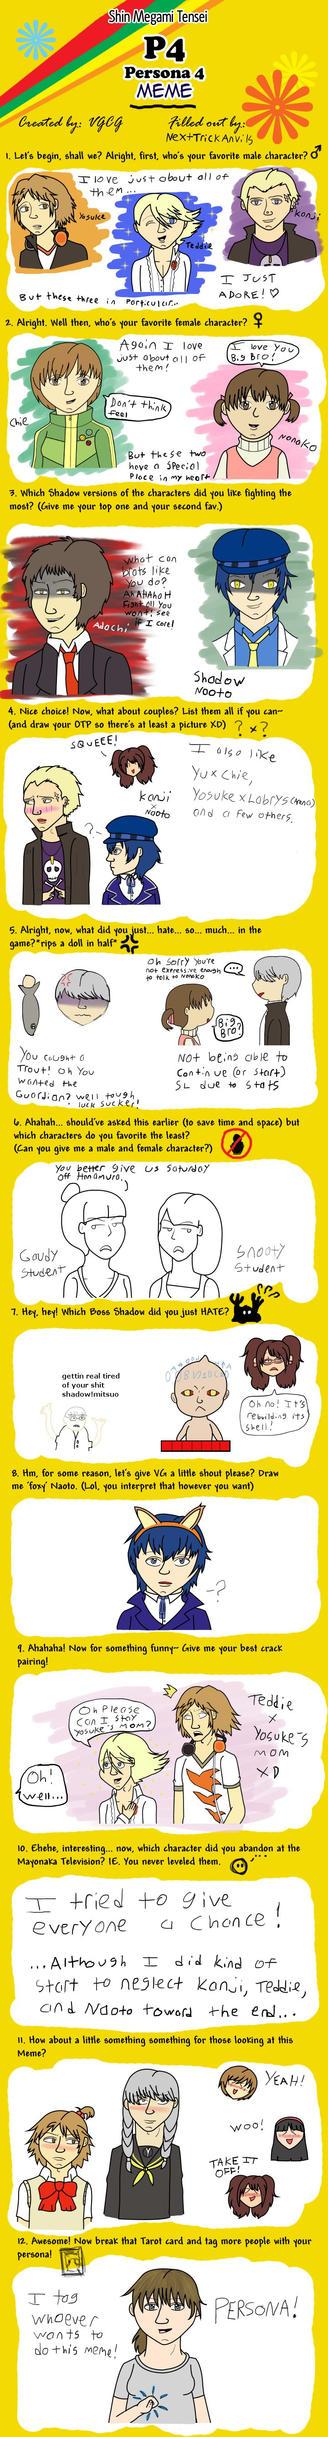 Persona 4 Meme BIG SPOILERS by NextTrickAnvils